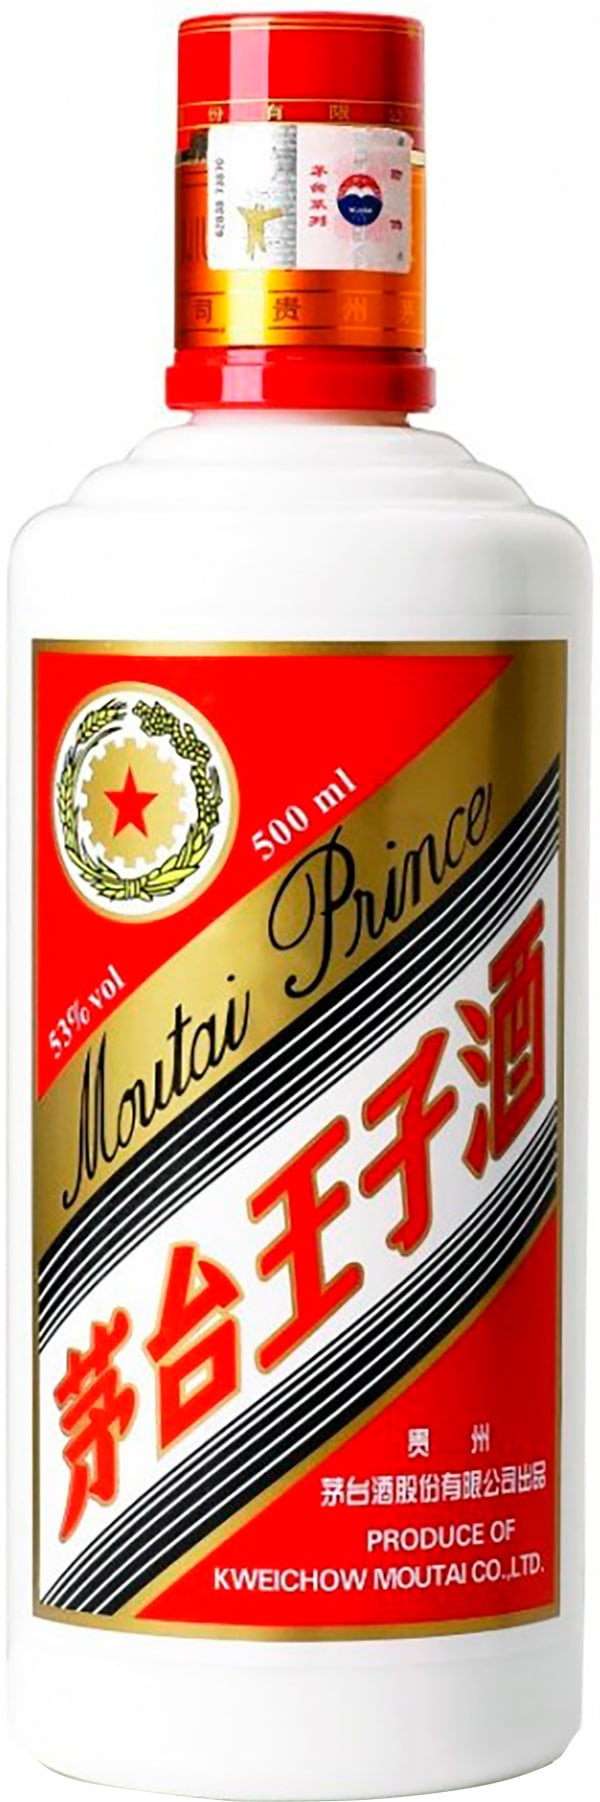 Kweichow Moutai Prince